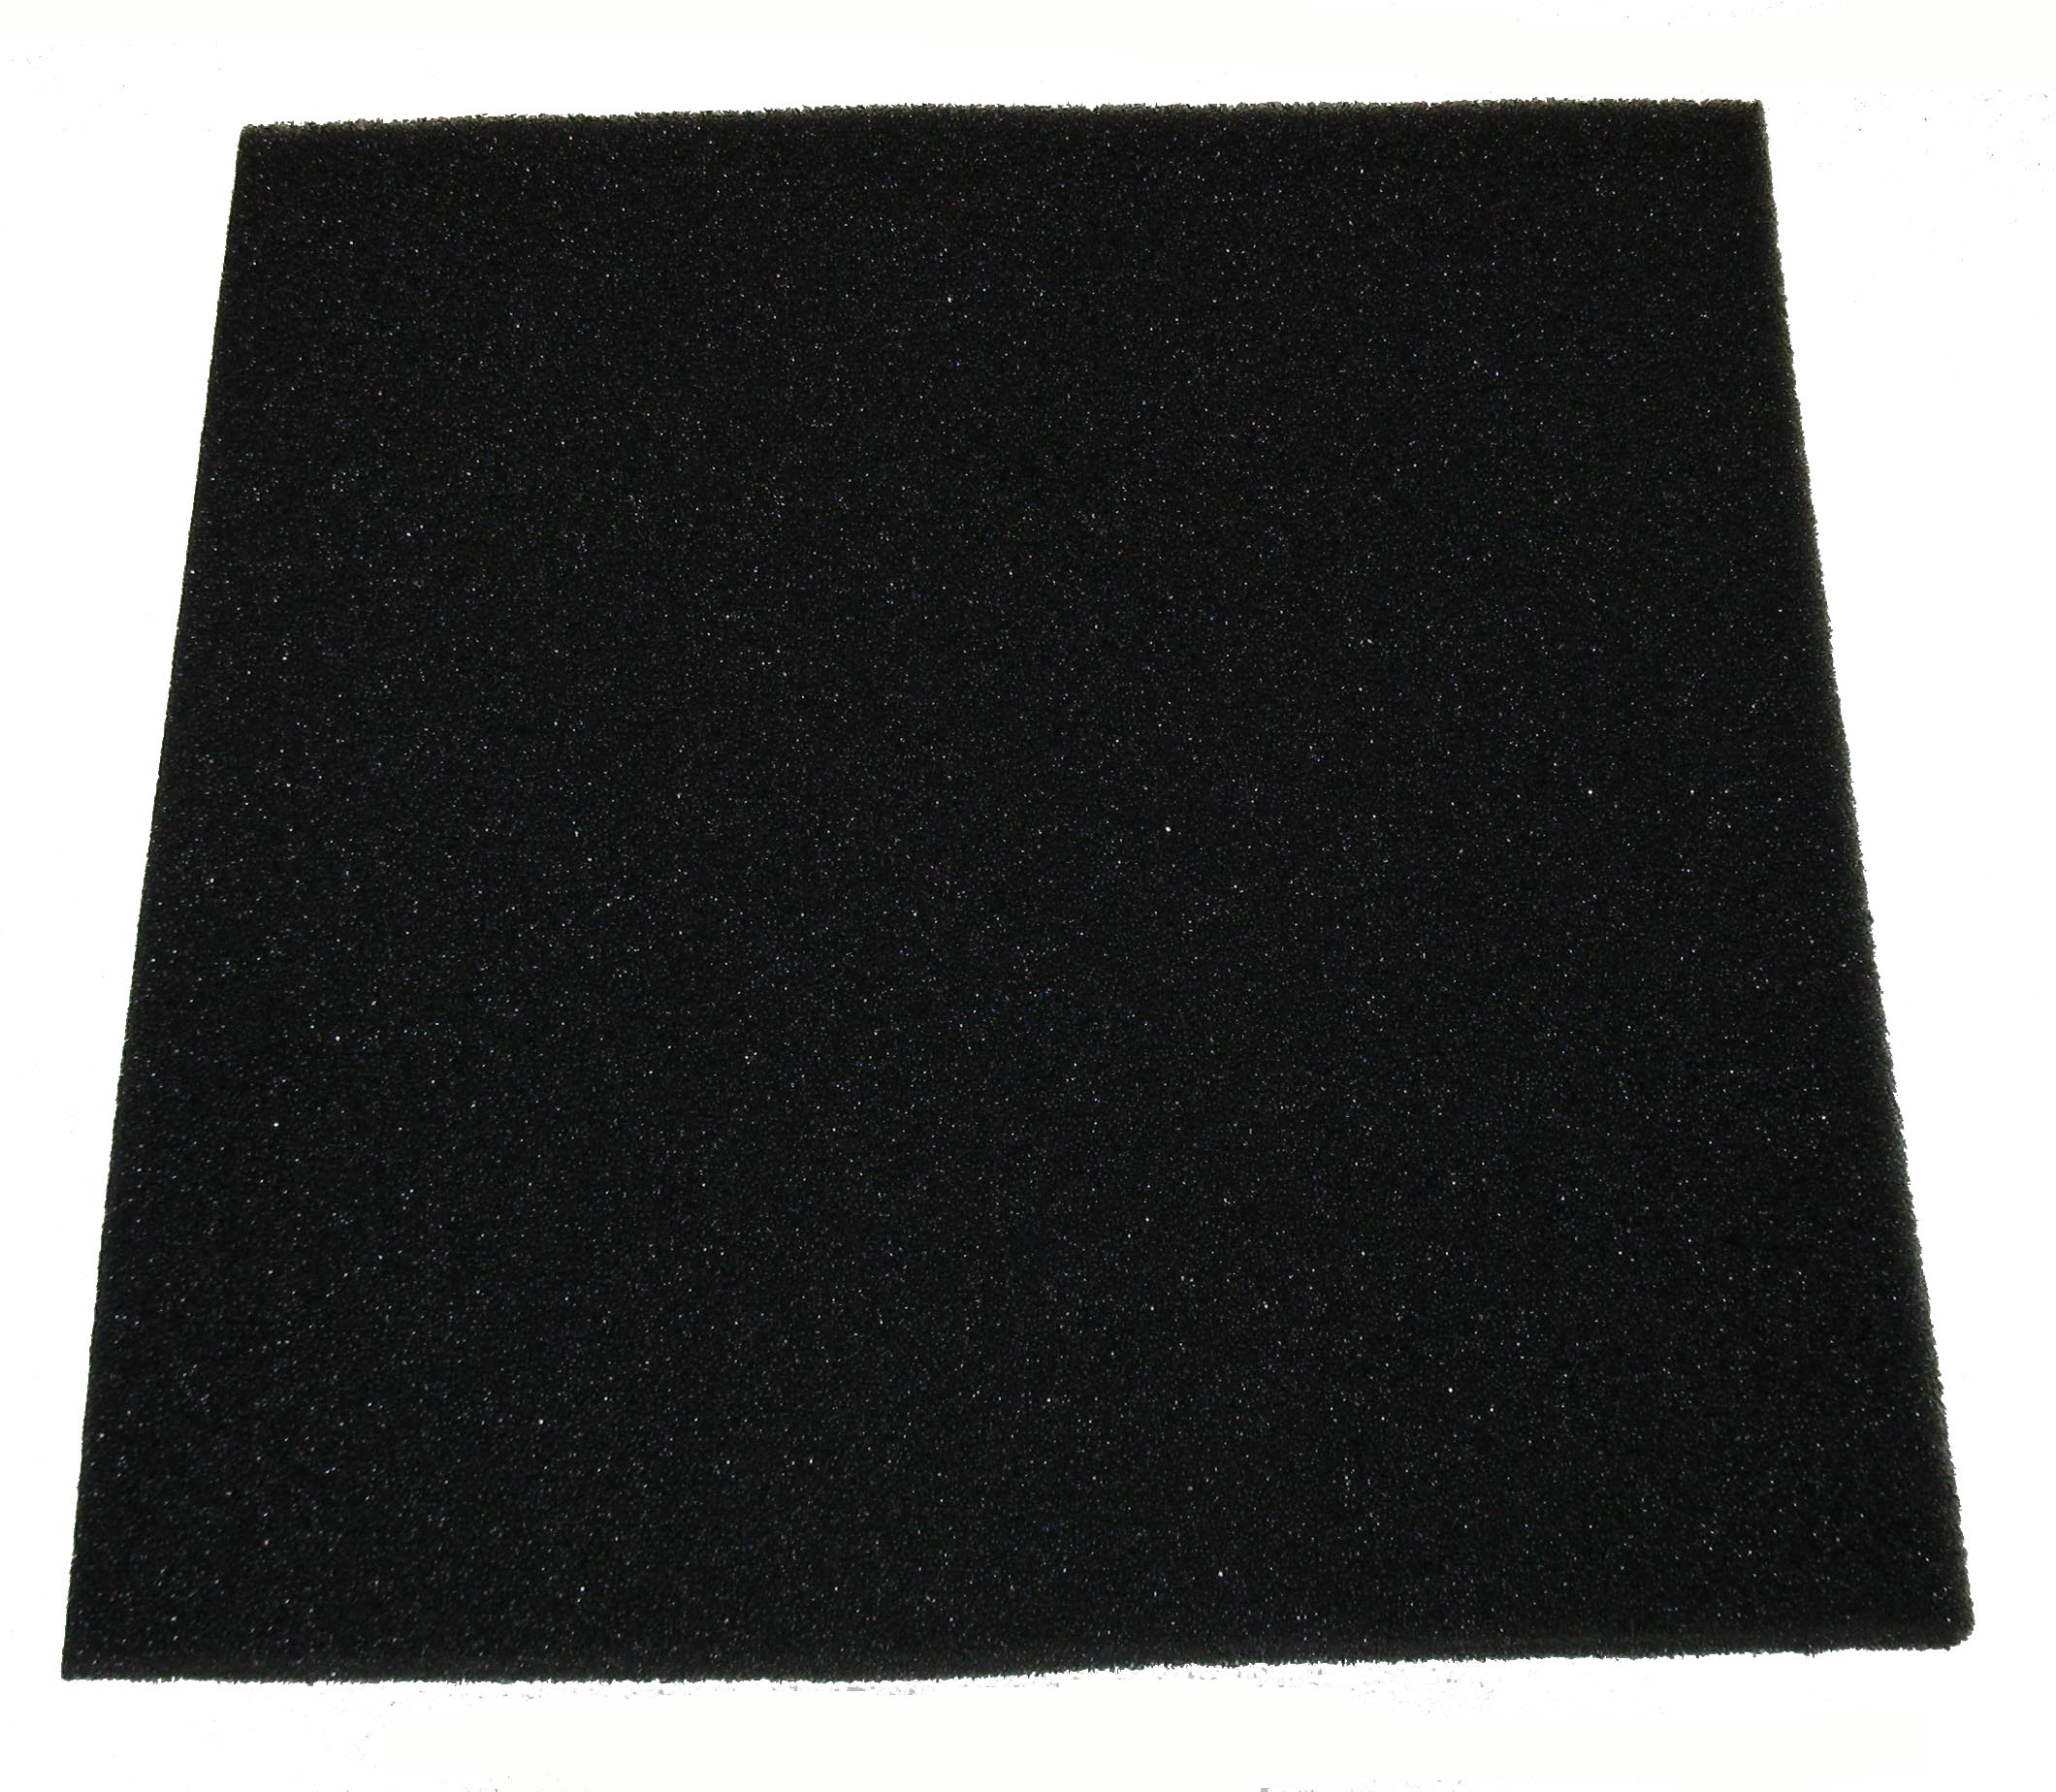 AXIAIR Hyabsorb® FIJNFILTER 260x340x10